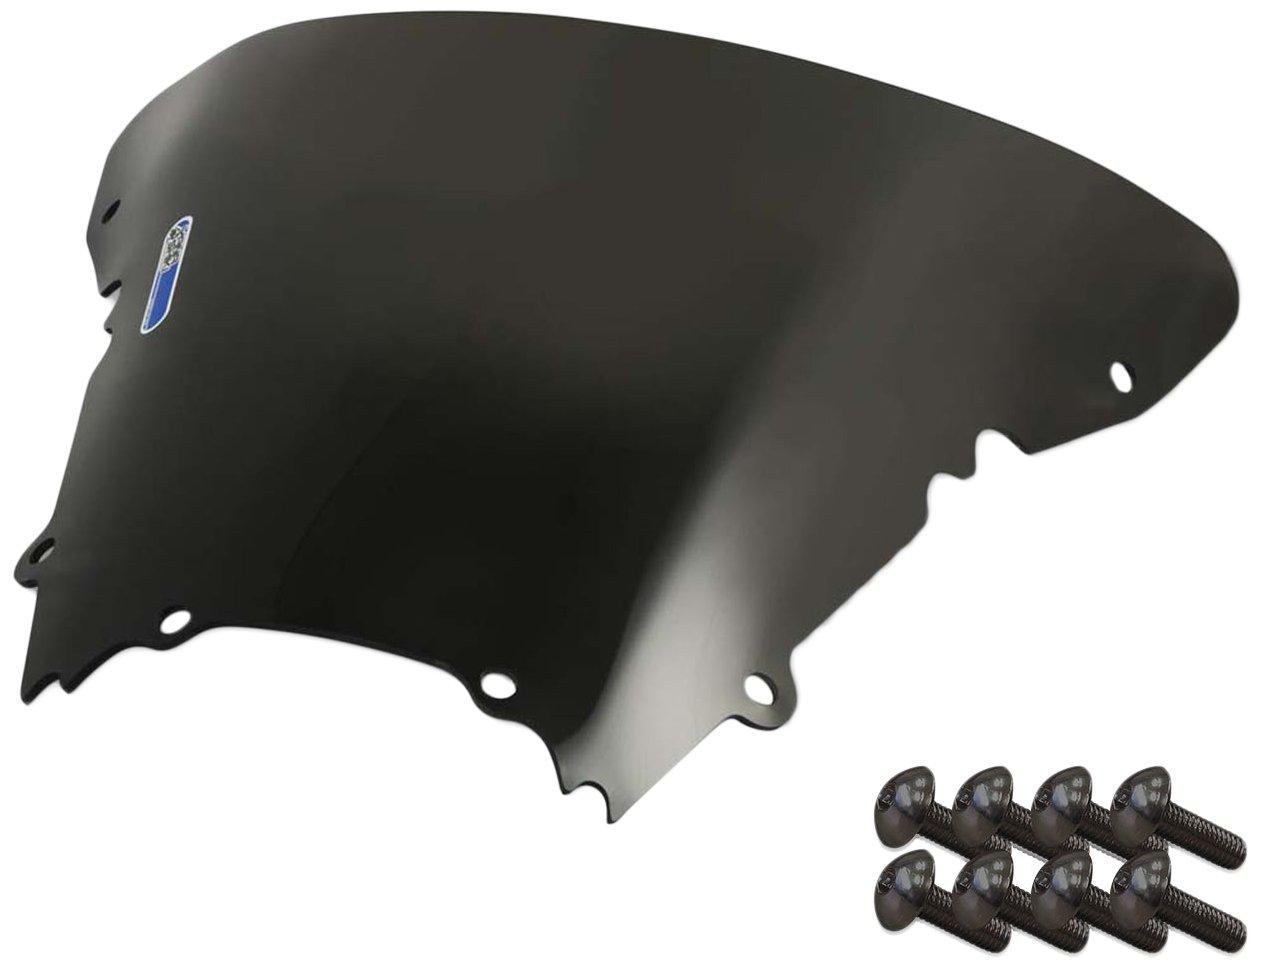 Sportbike Windscreens ADYW-301DS Dark Smoke Windscreen (Yamaha R6 (99-02) with Silver Screw Kit), 2 Pack